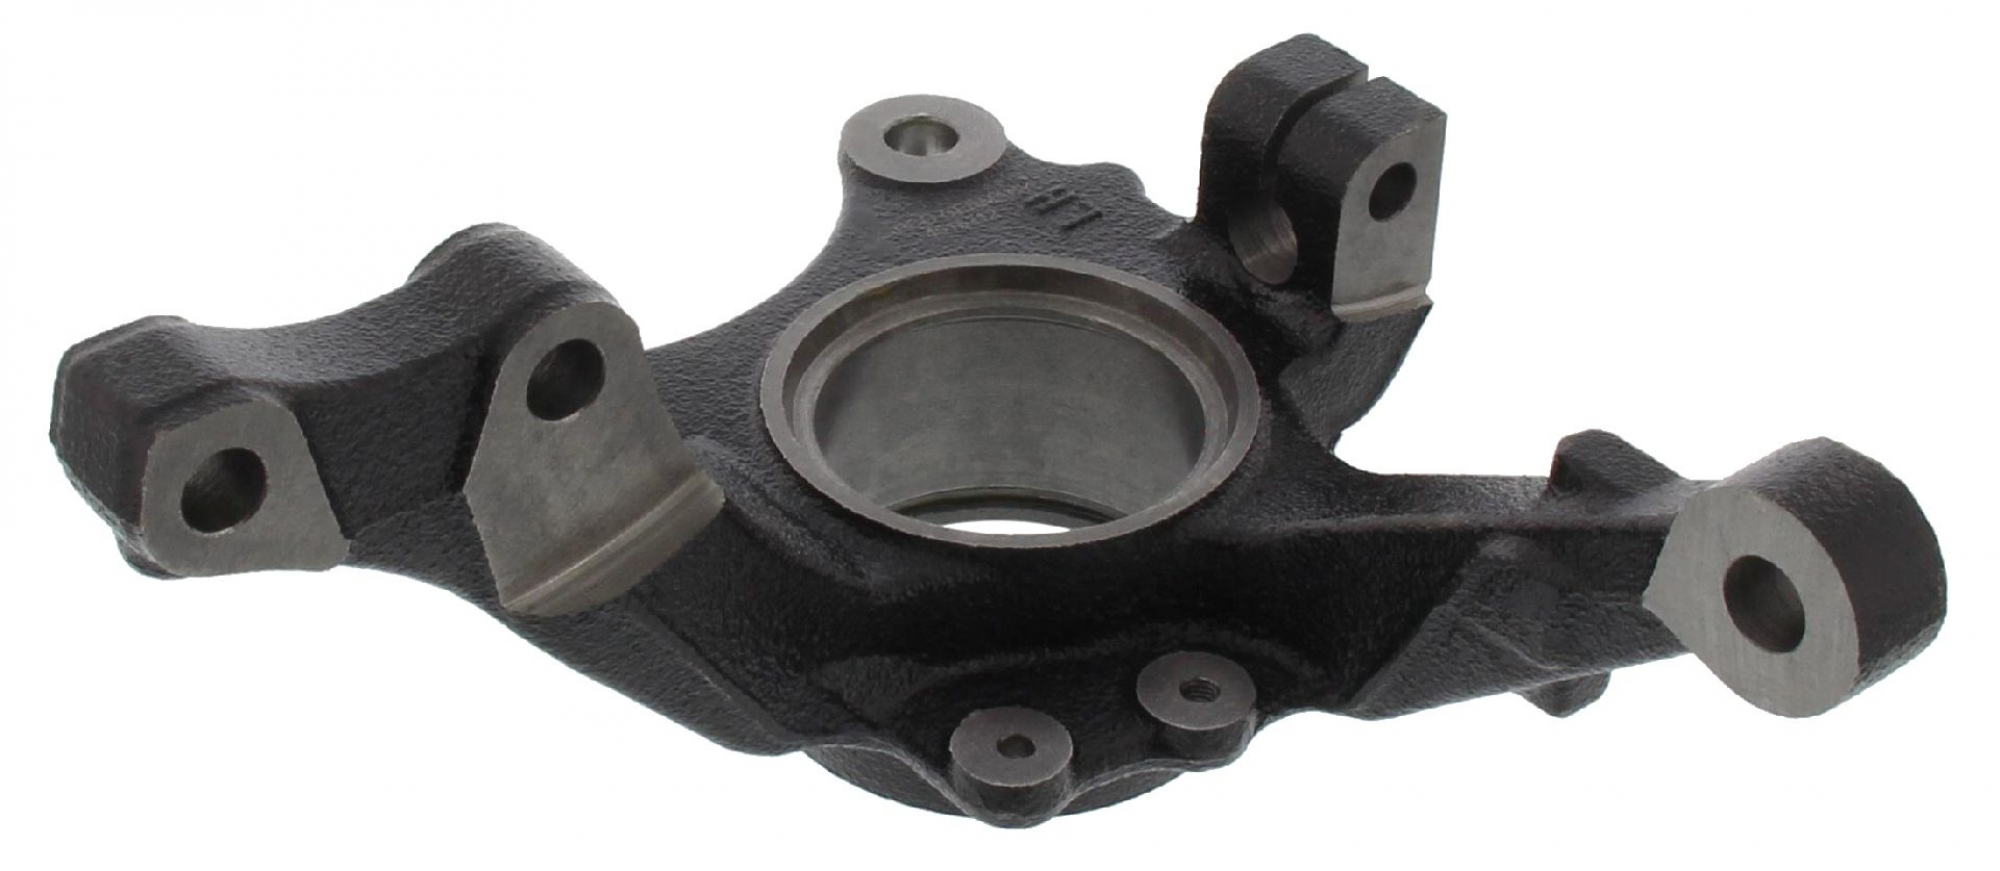 MAPCO 107708 Stub Axle, wheel suspension